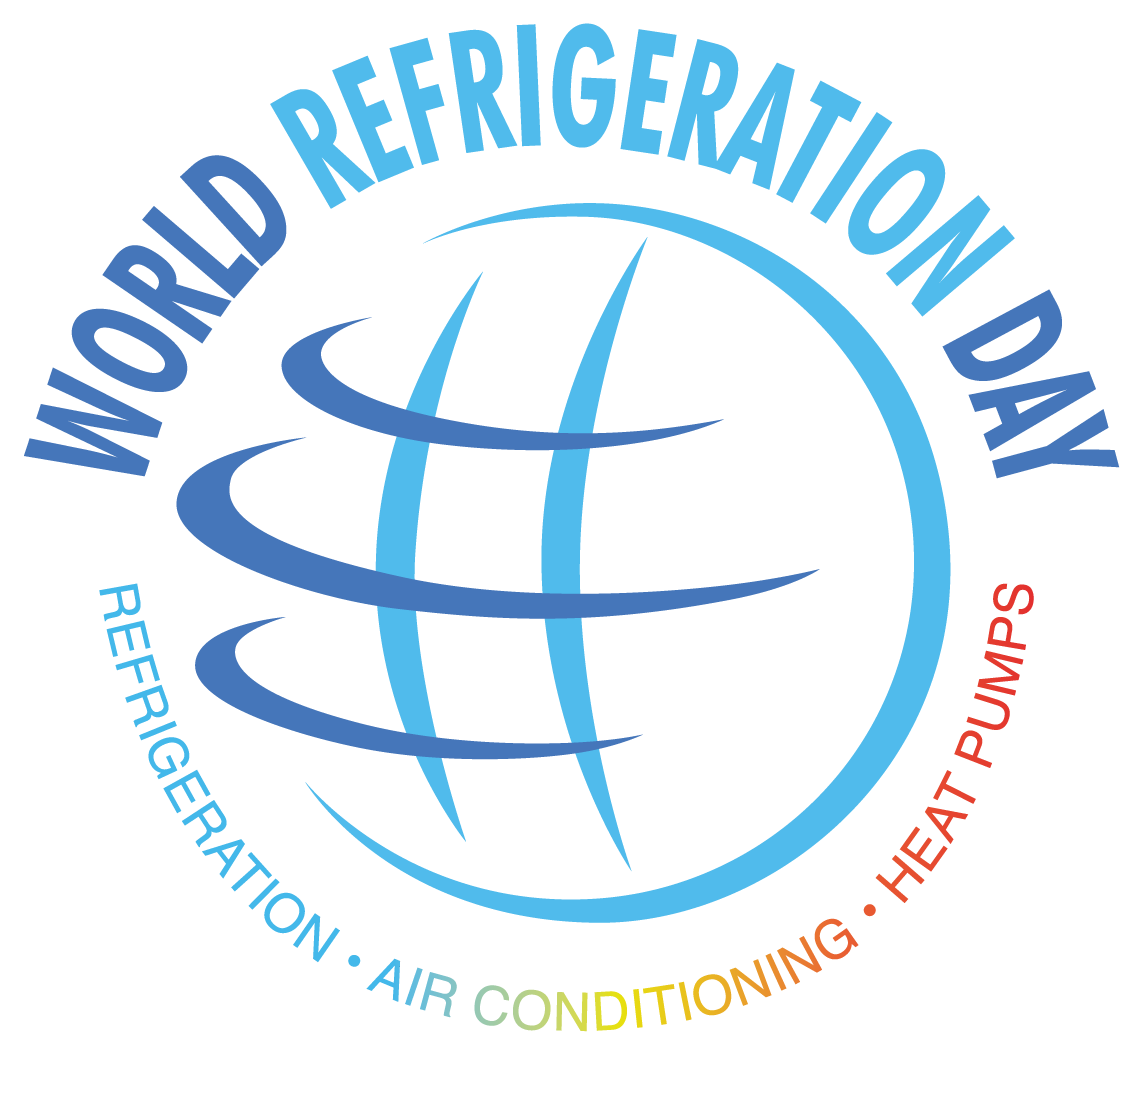 http://www.schiessl.com.ua/wp-content/uploads/2019/08/World-Refrigeration-Day.png